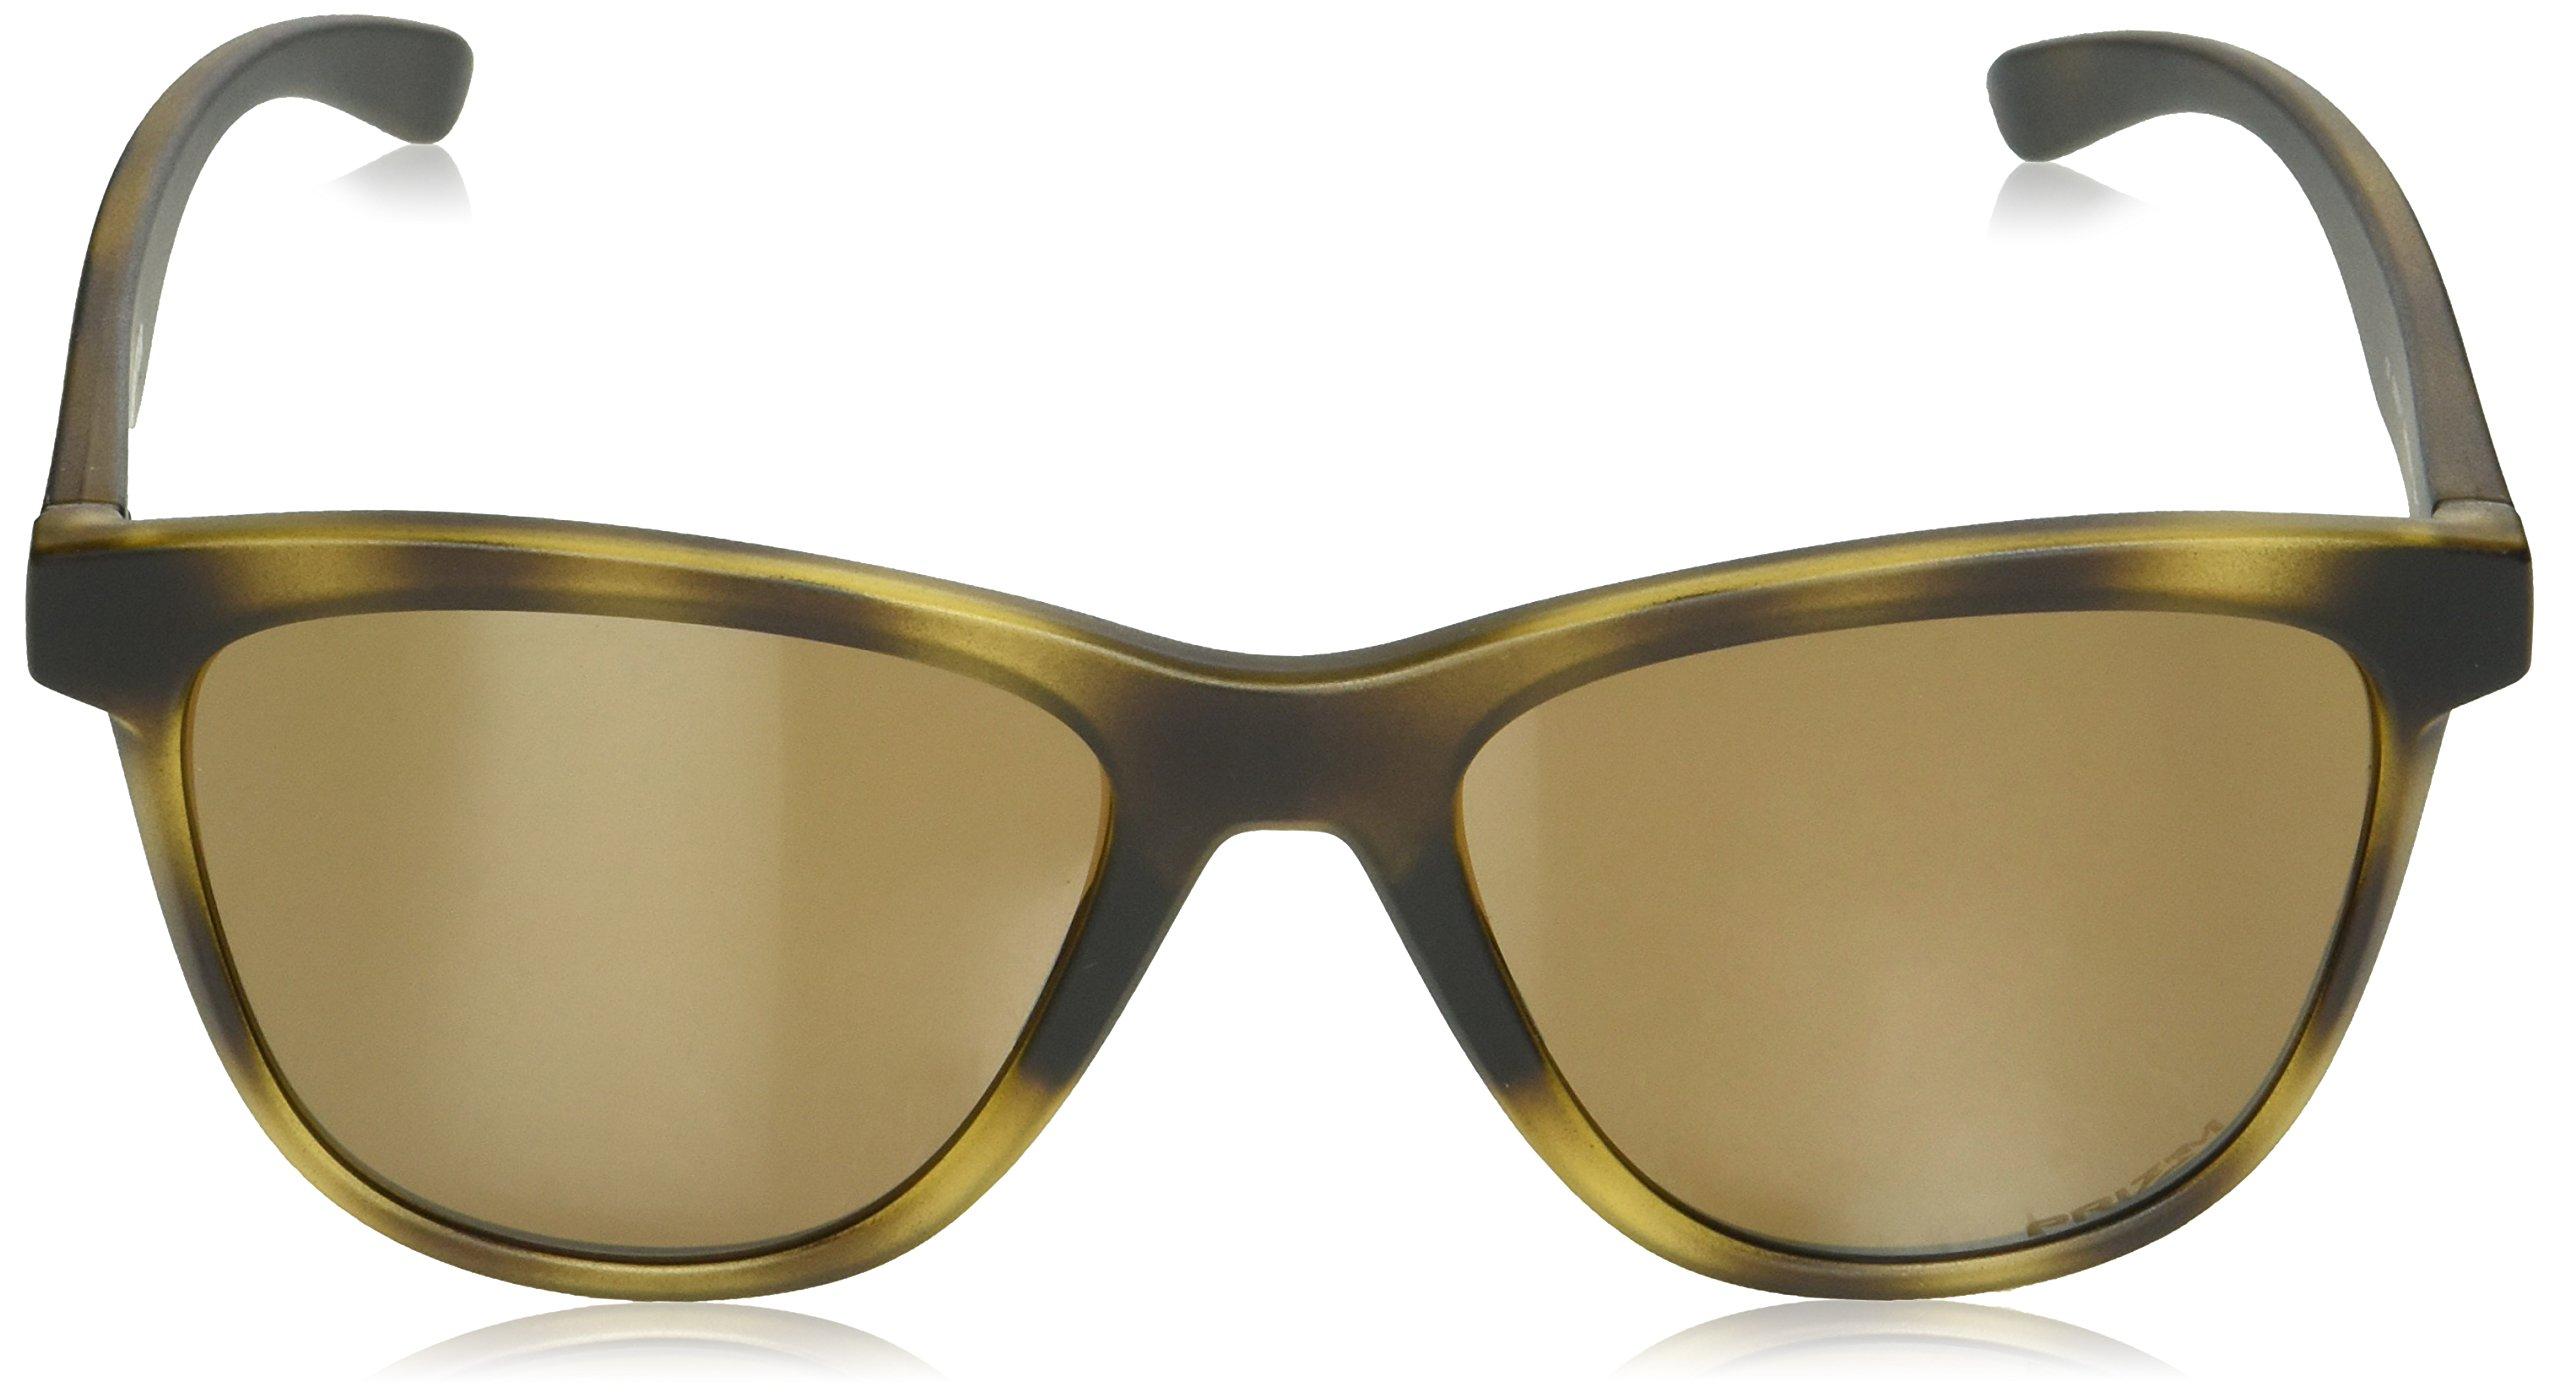 061f42ee4201 Oakley Womens Moonlighter Sunglasses (OO9320) Plastic